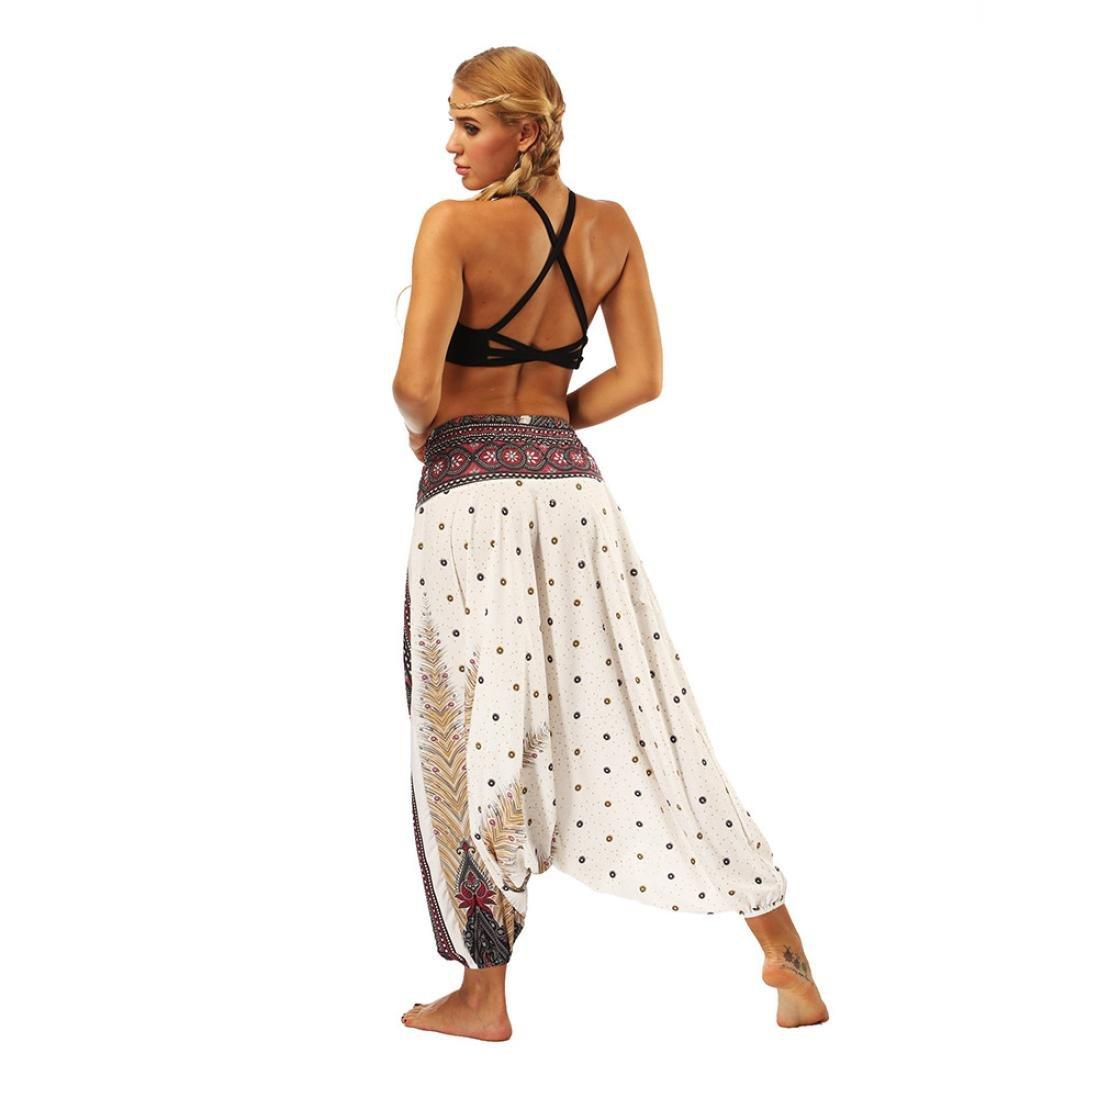 Haremshose,Resplend Thai Hippie Boho Hose L/ässige Lose Yoga Hosen Baggy Hosenrock Aladinhose Yogahosen Pumphose F/ür Damen /& Herren